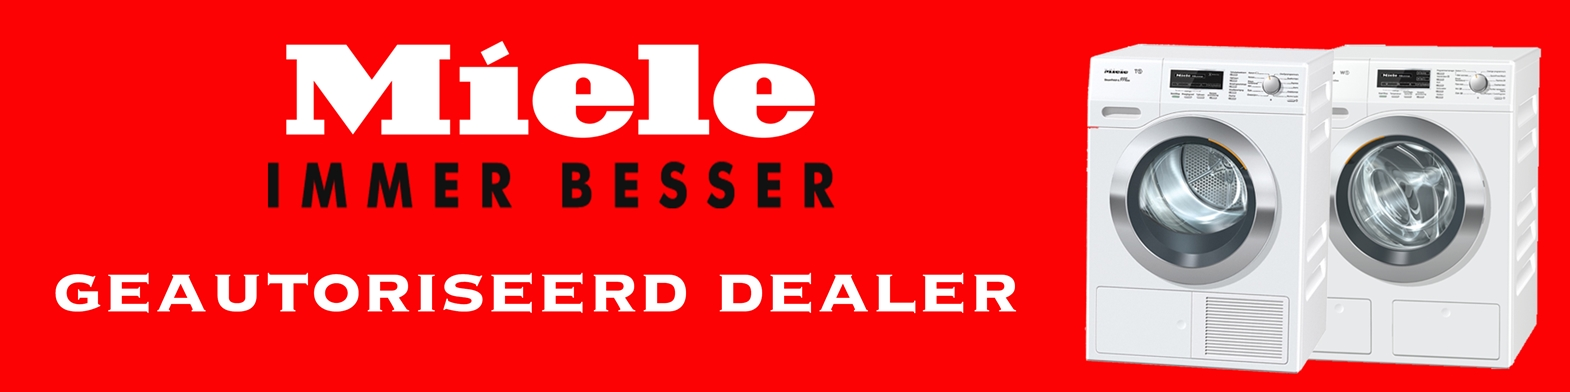 Miele Dealer